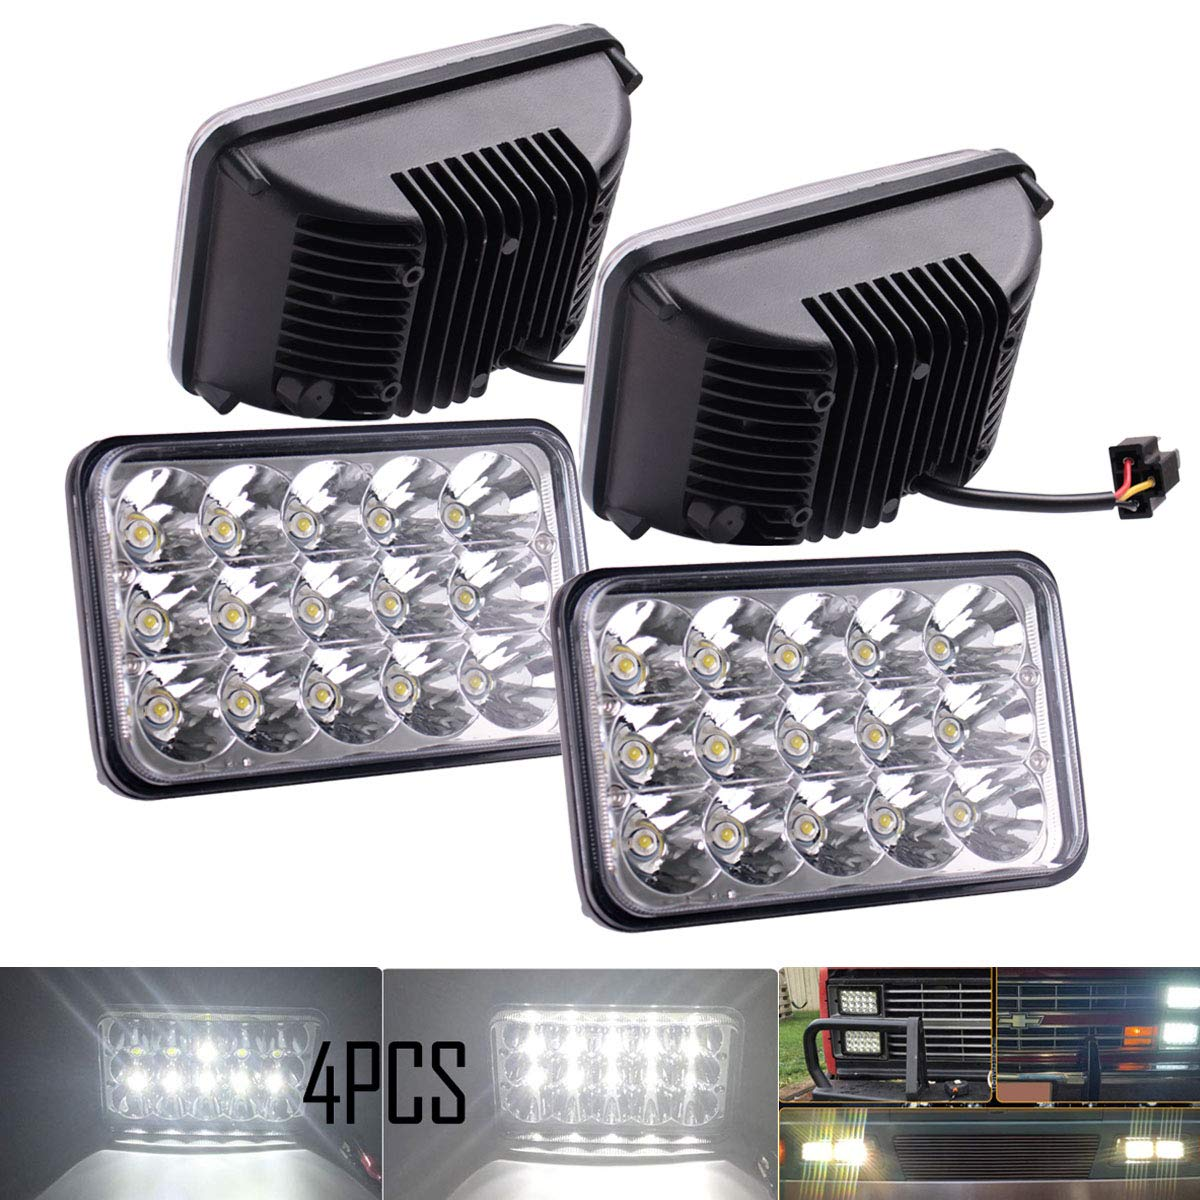 BLIAUTO Compatible with H6054 LED Headlights Jeep Xj Yj Cherokee E250 S10 Toyota Ford Ranger Trucks